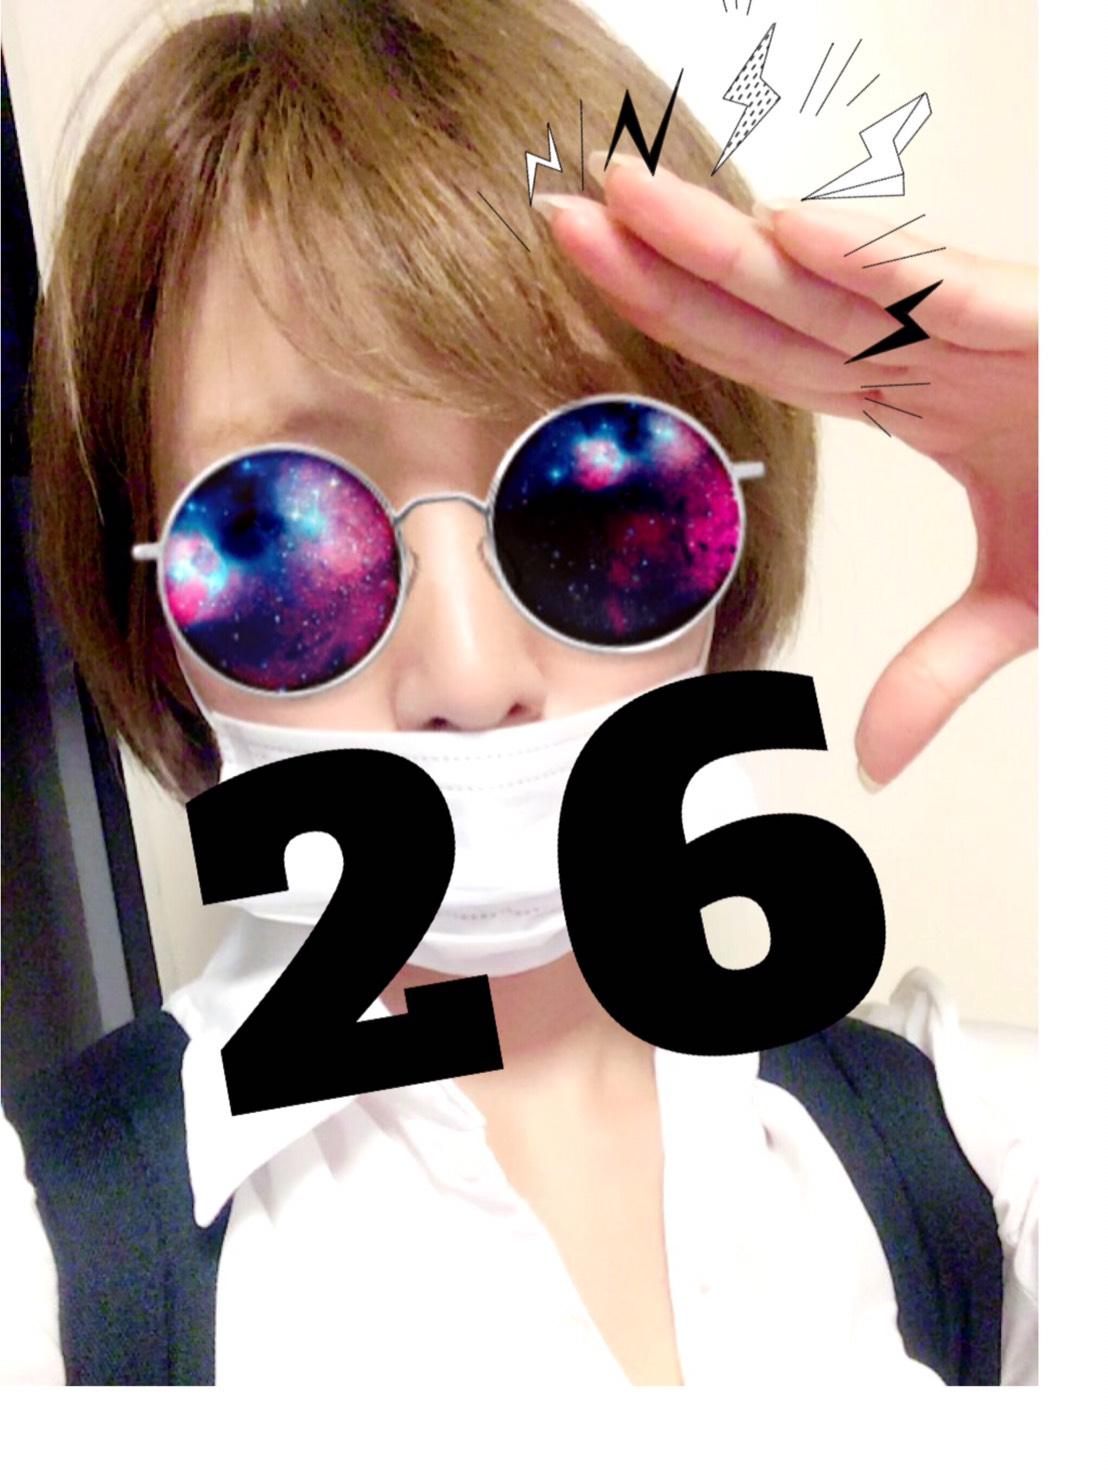 S__24772612.jpg